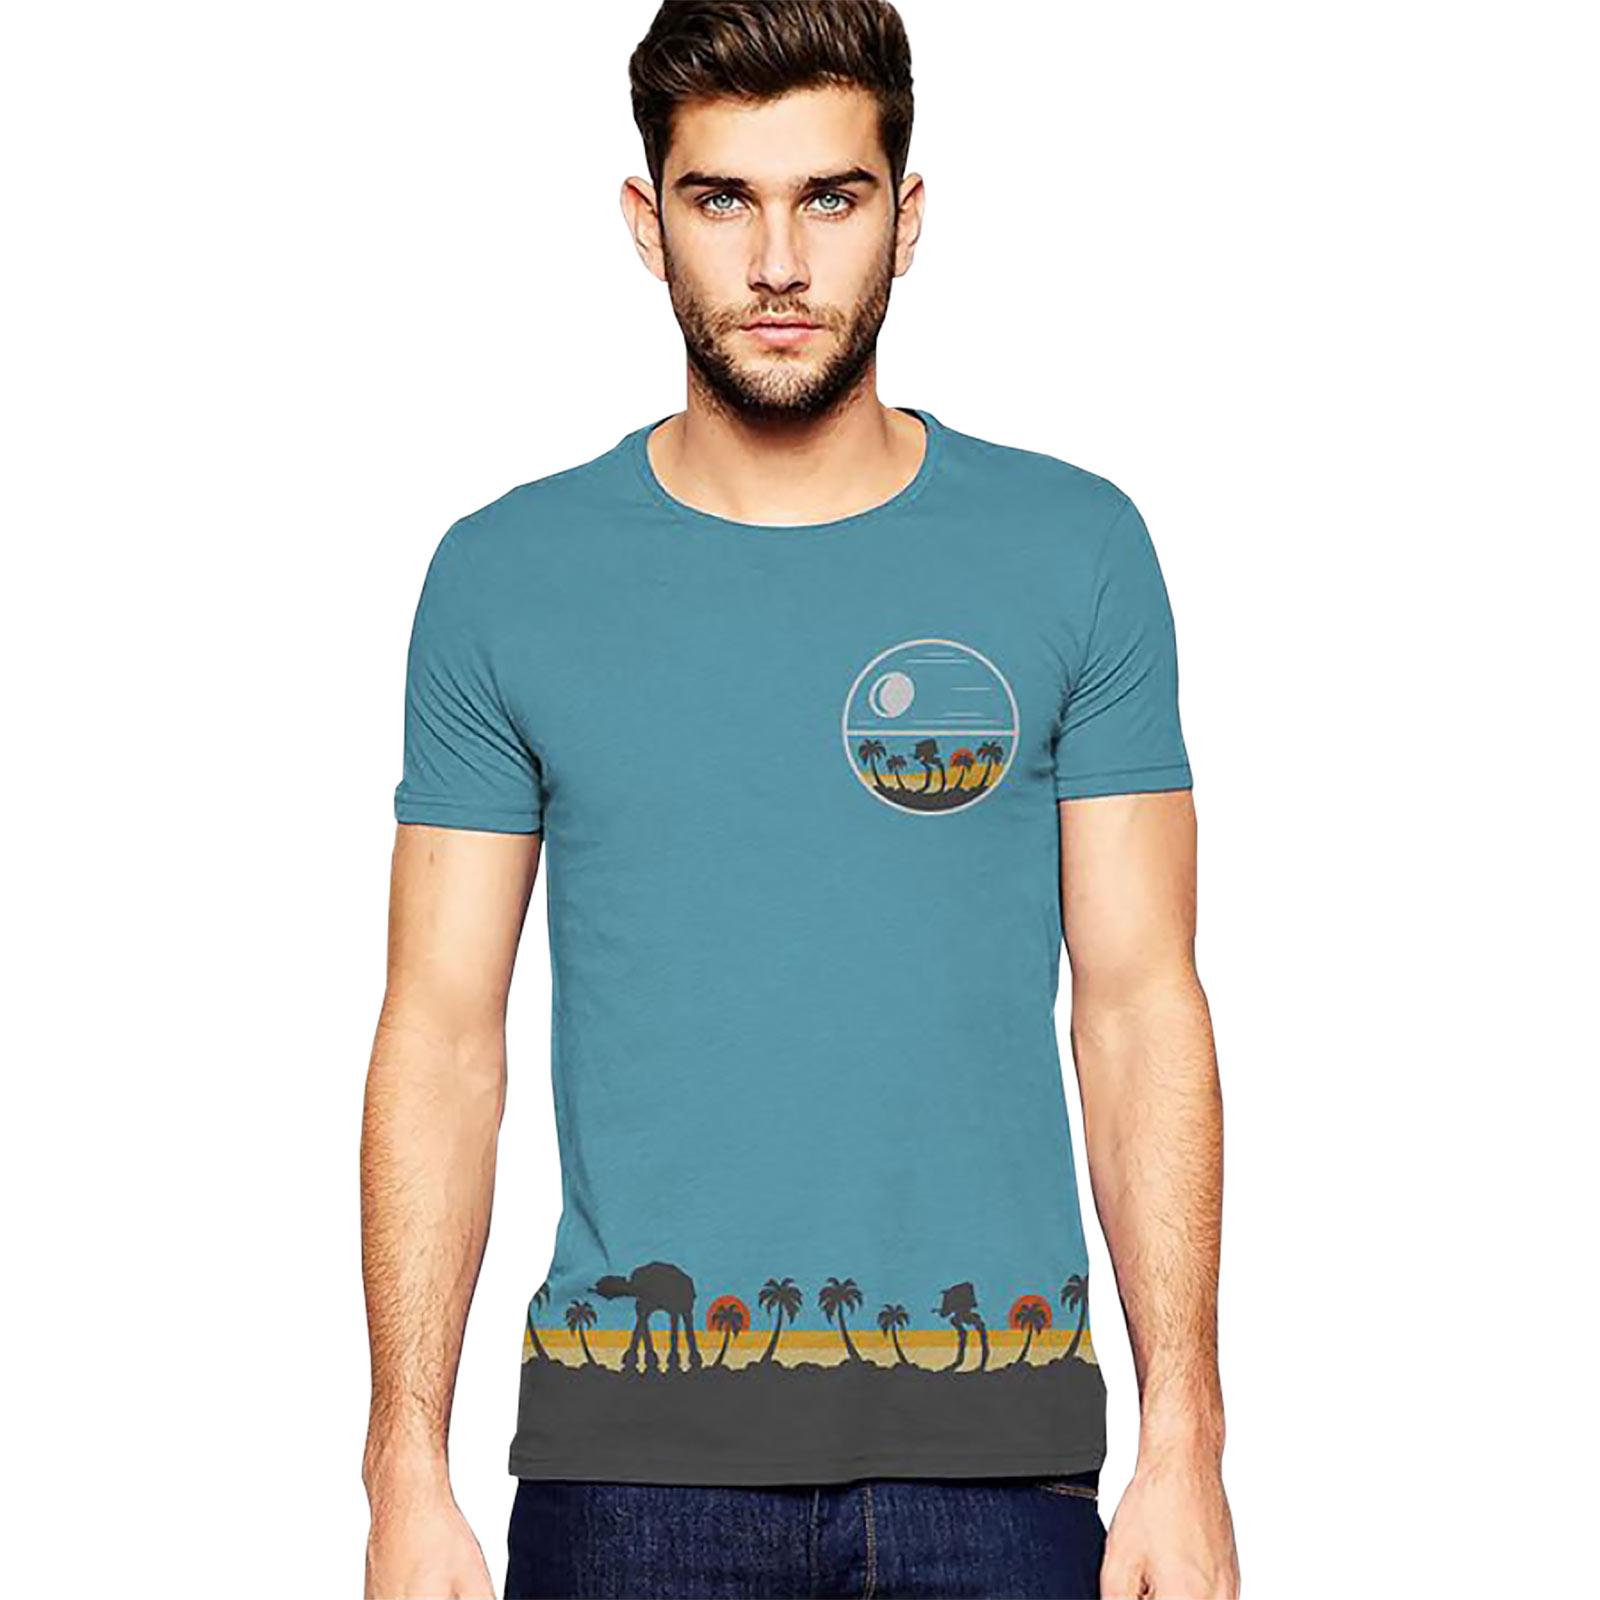 Star Wars - Rogue One Tropical Scene T-Shirt